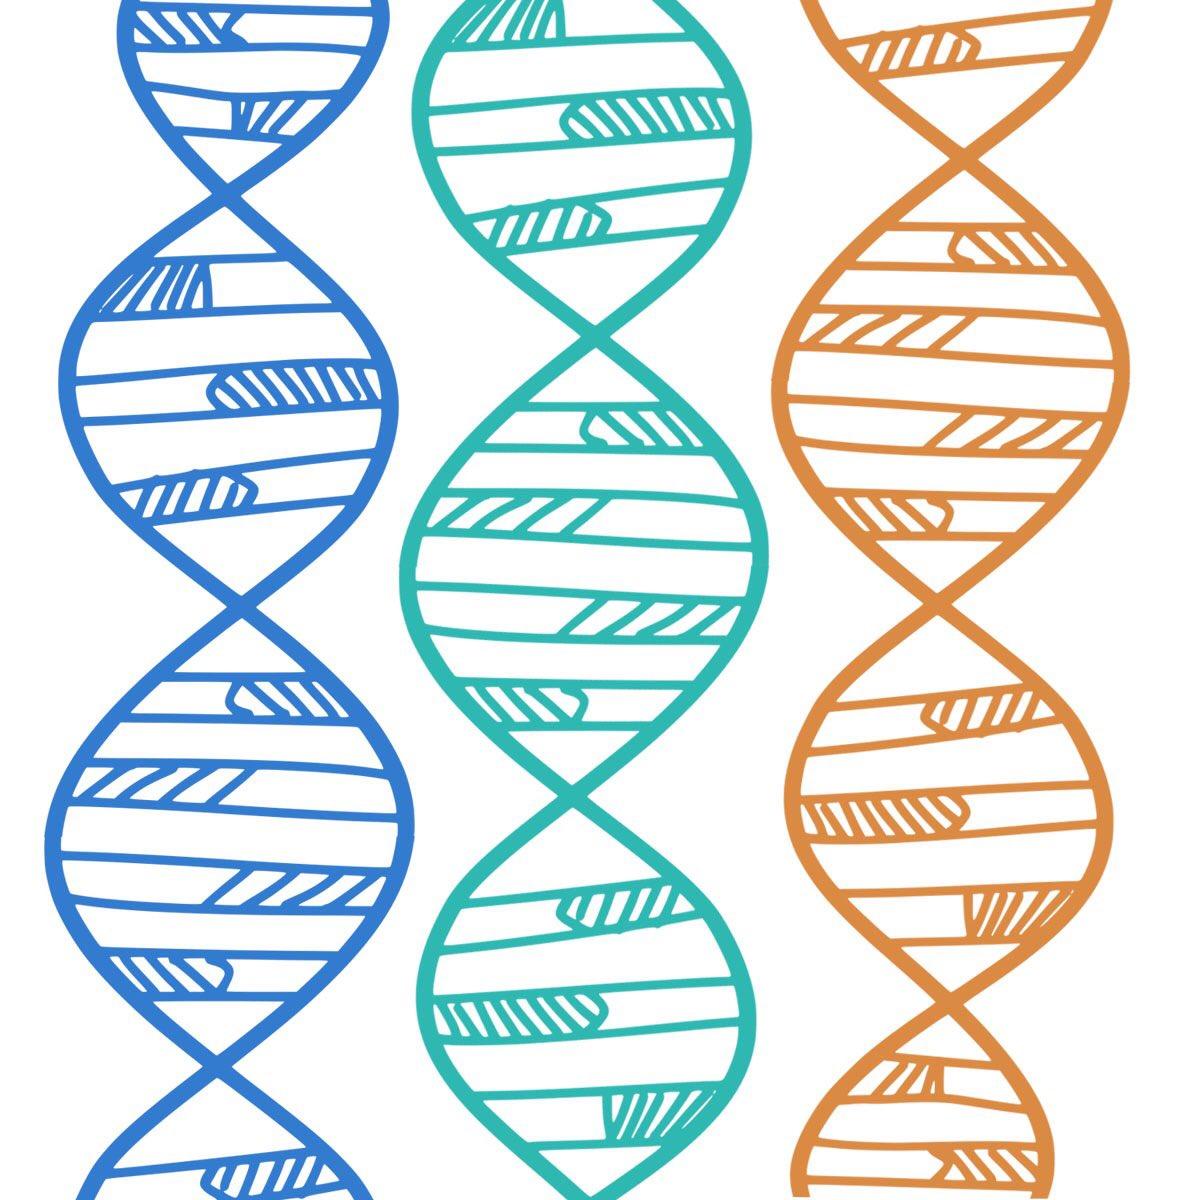 advances in genetics clipart 10 free Cliparts | Download ...